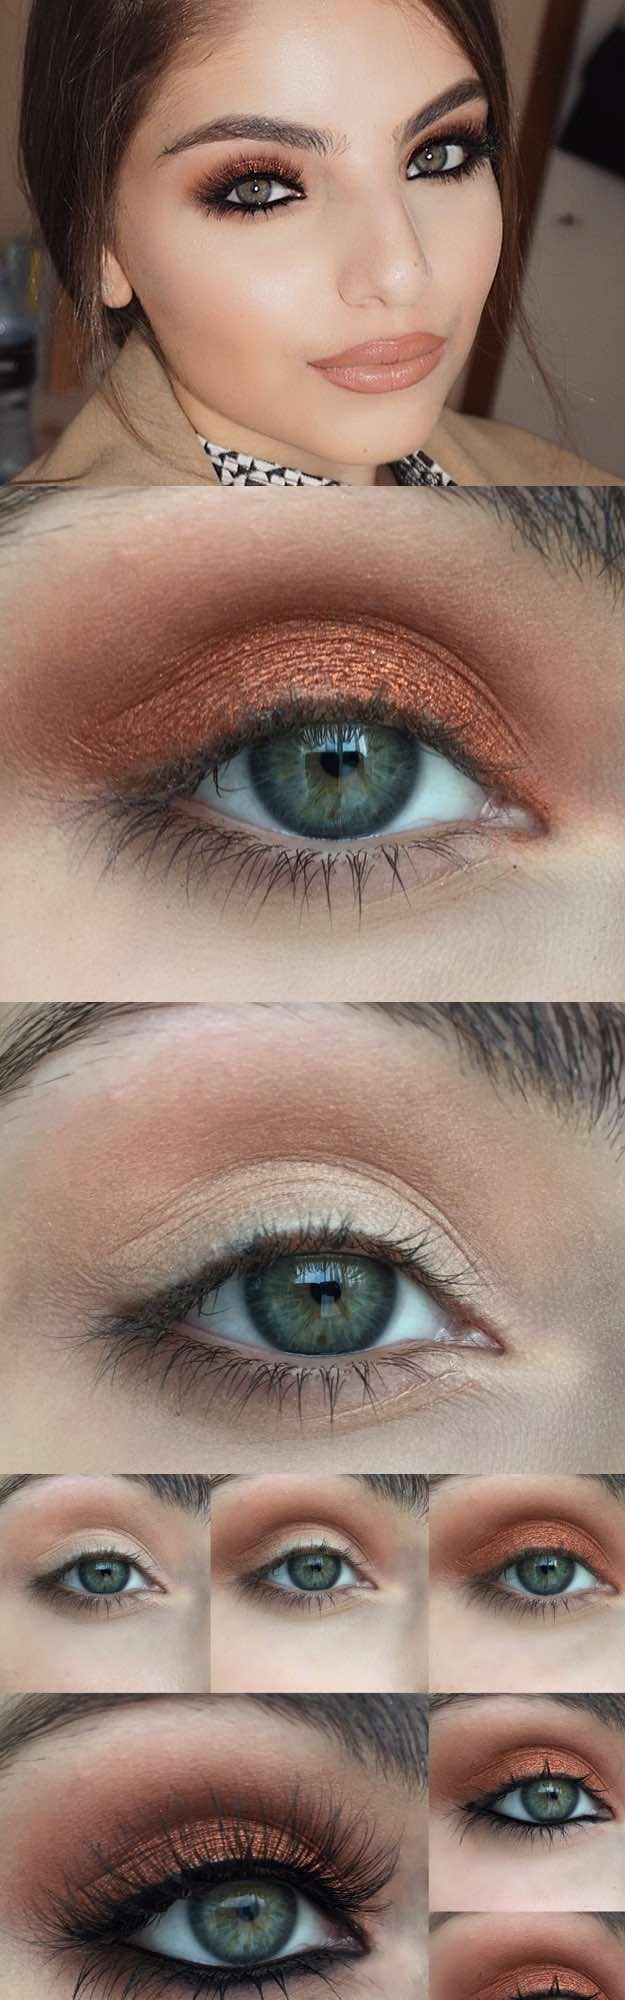 Makeup Tutorials For Green Eyes 50 Perfect Makeup Tutorials For Green Eyes The Goddess